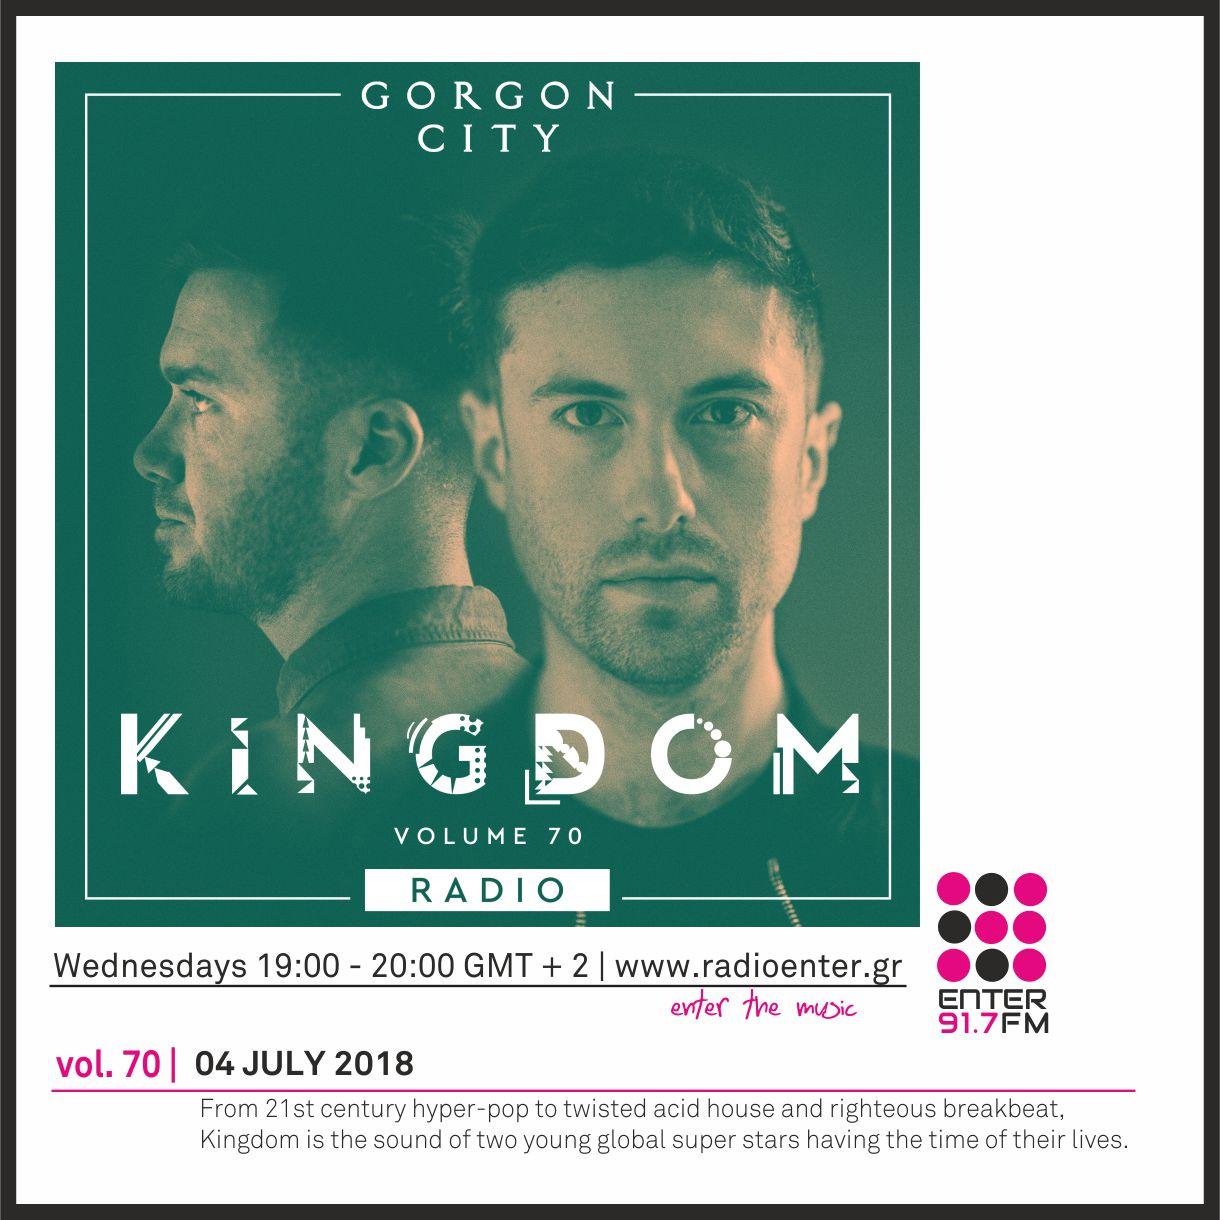 2018.07.04 - Gorgon City 'Kingdom' 070